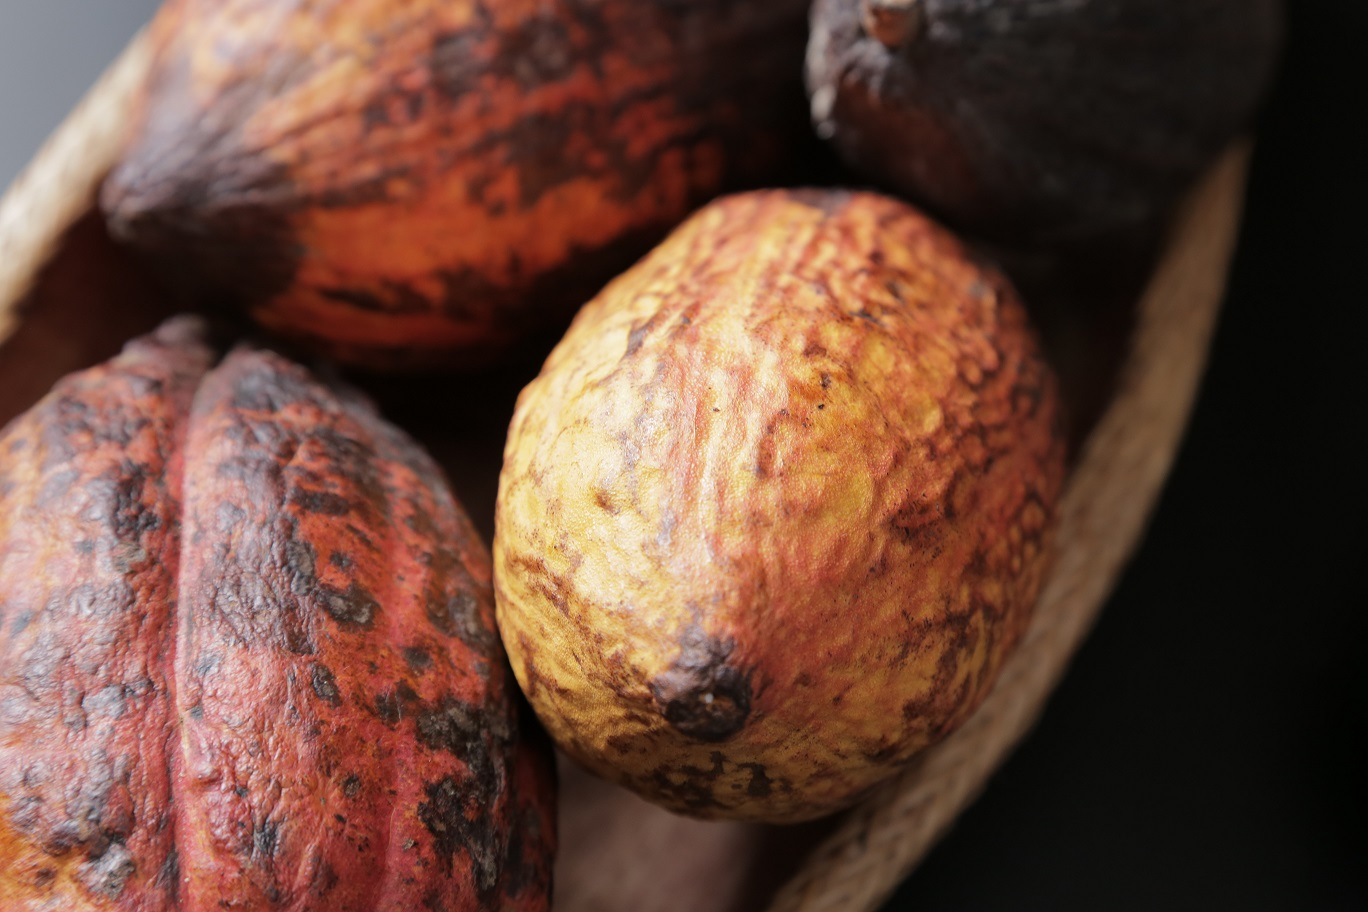 Schokoladen-Tour in Costa Rica